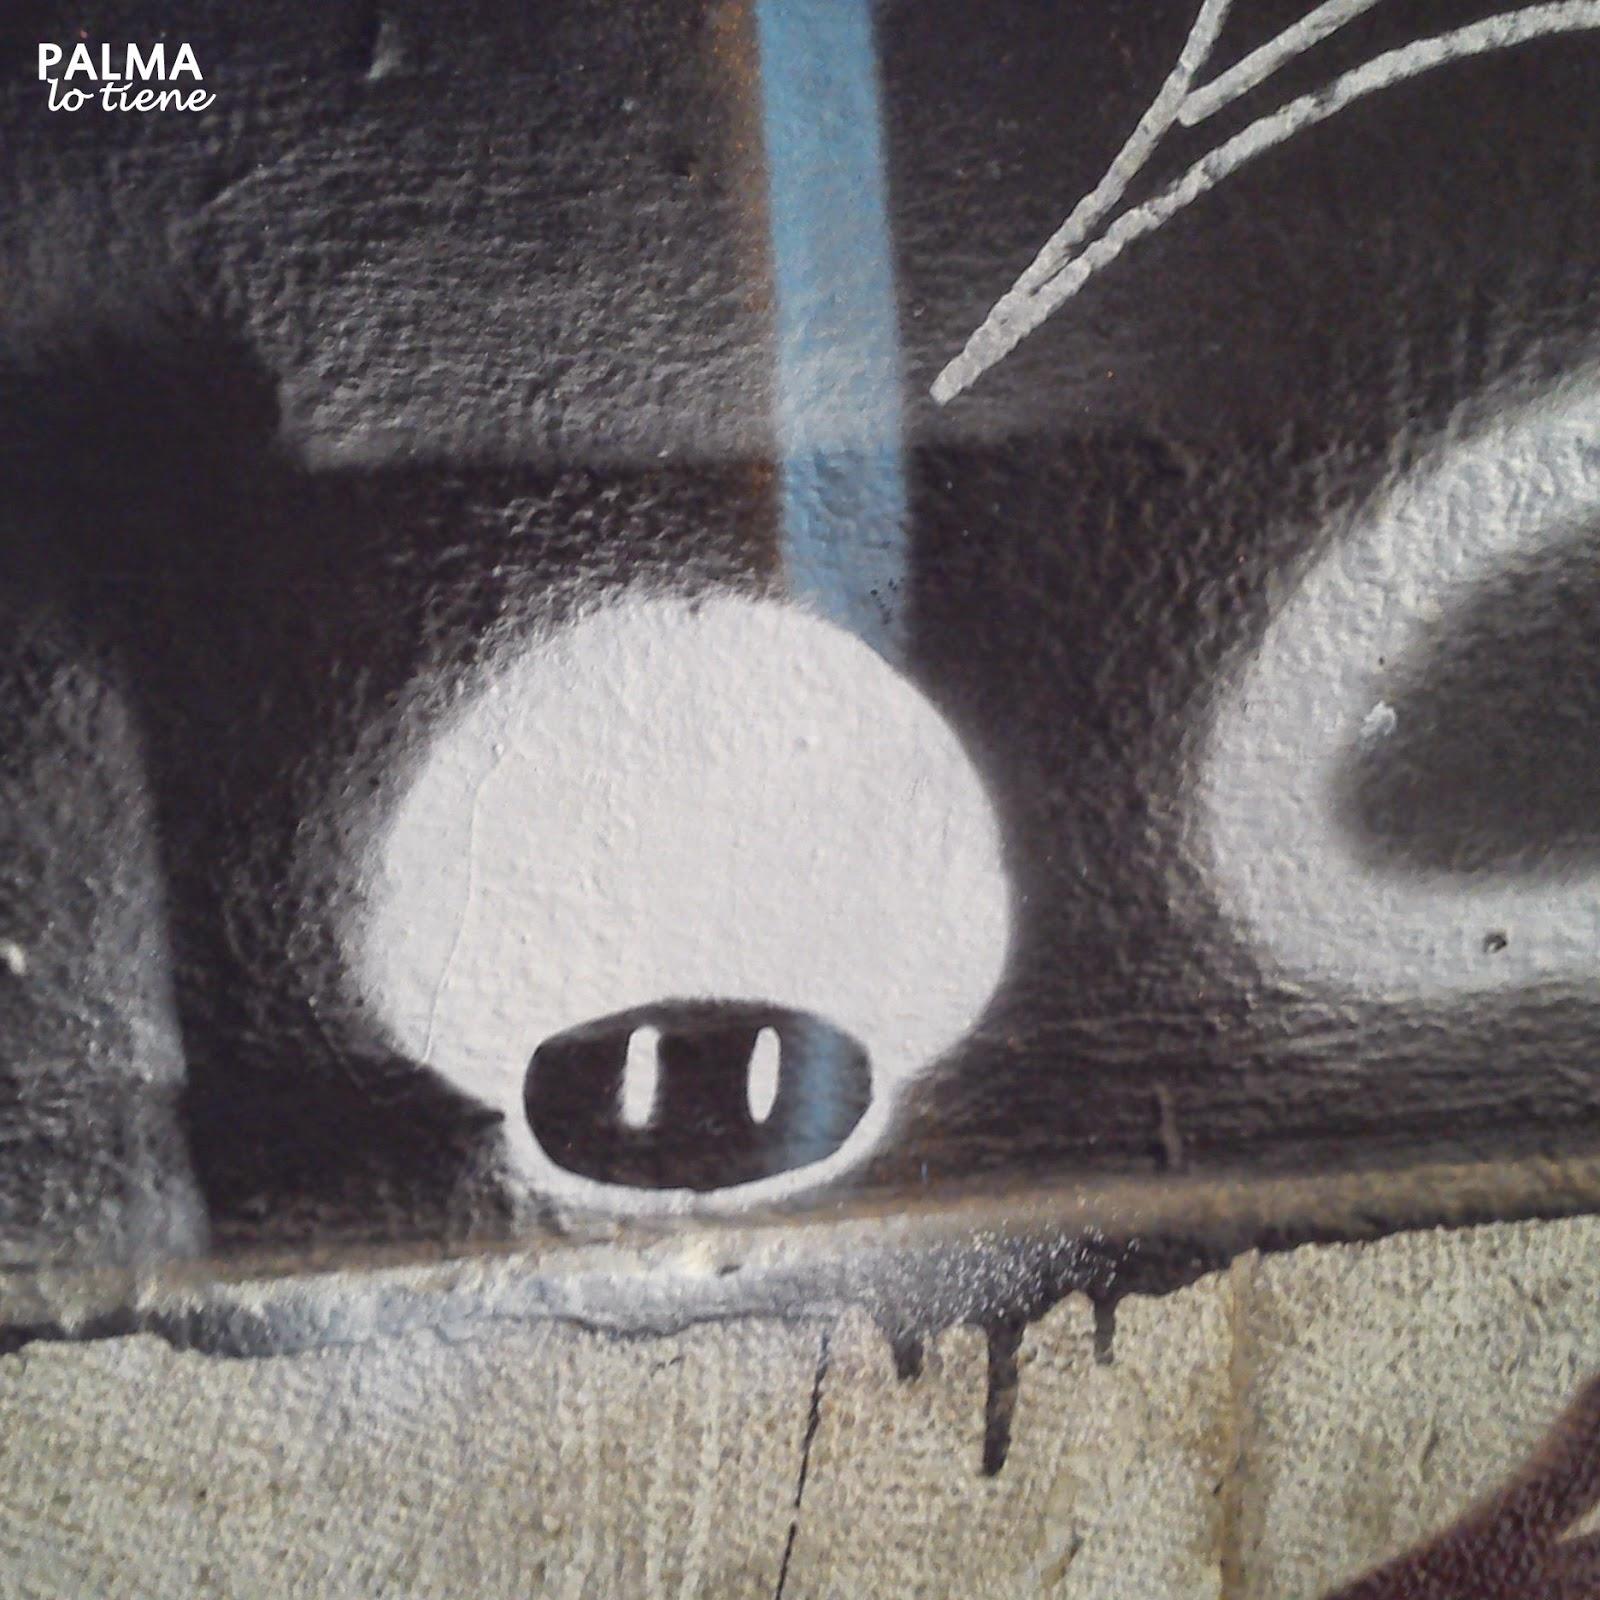 http://palmalotiene.blogspot.com.es/2014/09/super-mario-bros.html